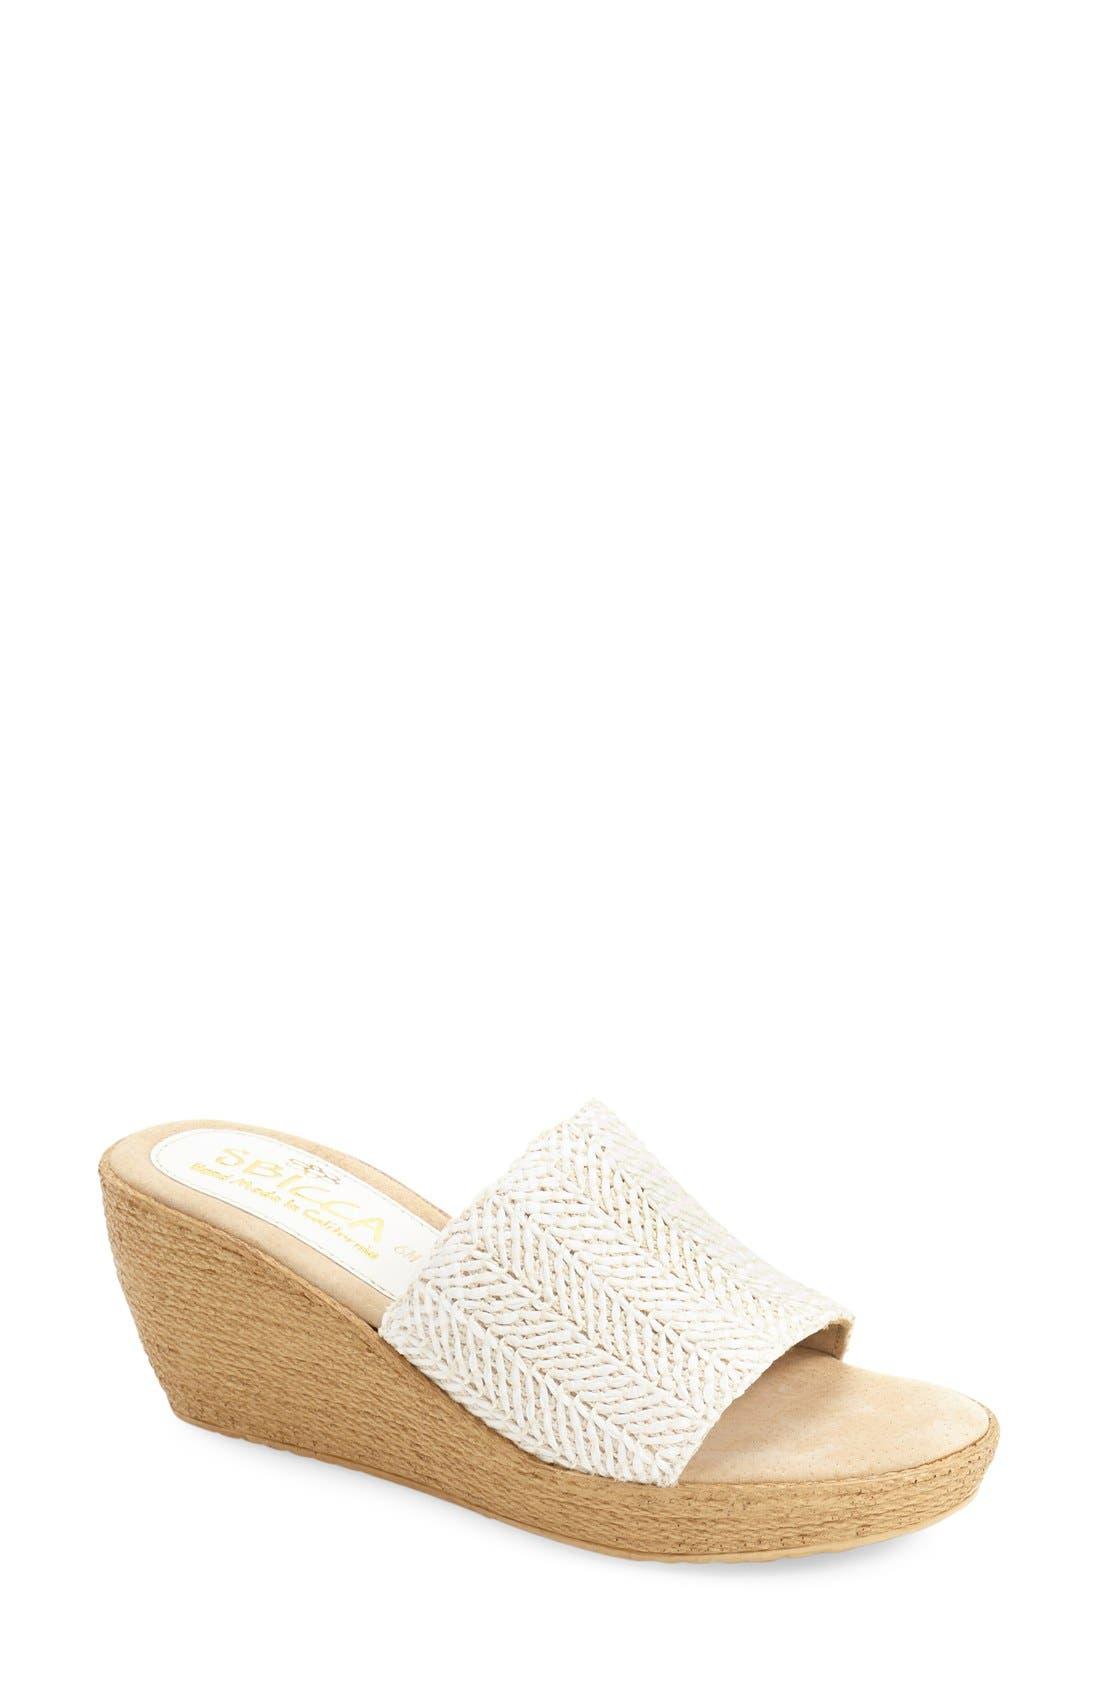 Alternate Image 1 Selected - Sbicca 'Fiorella' Sandal (Women)